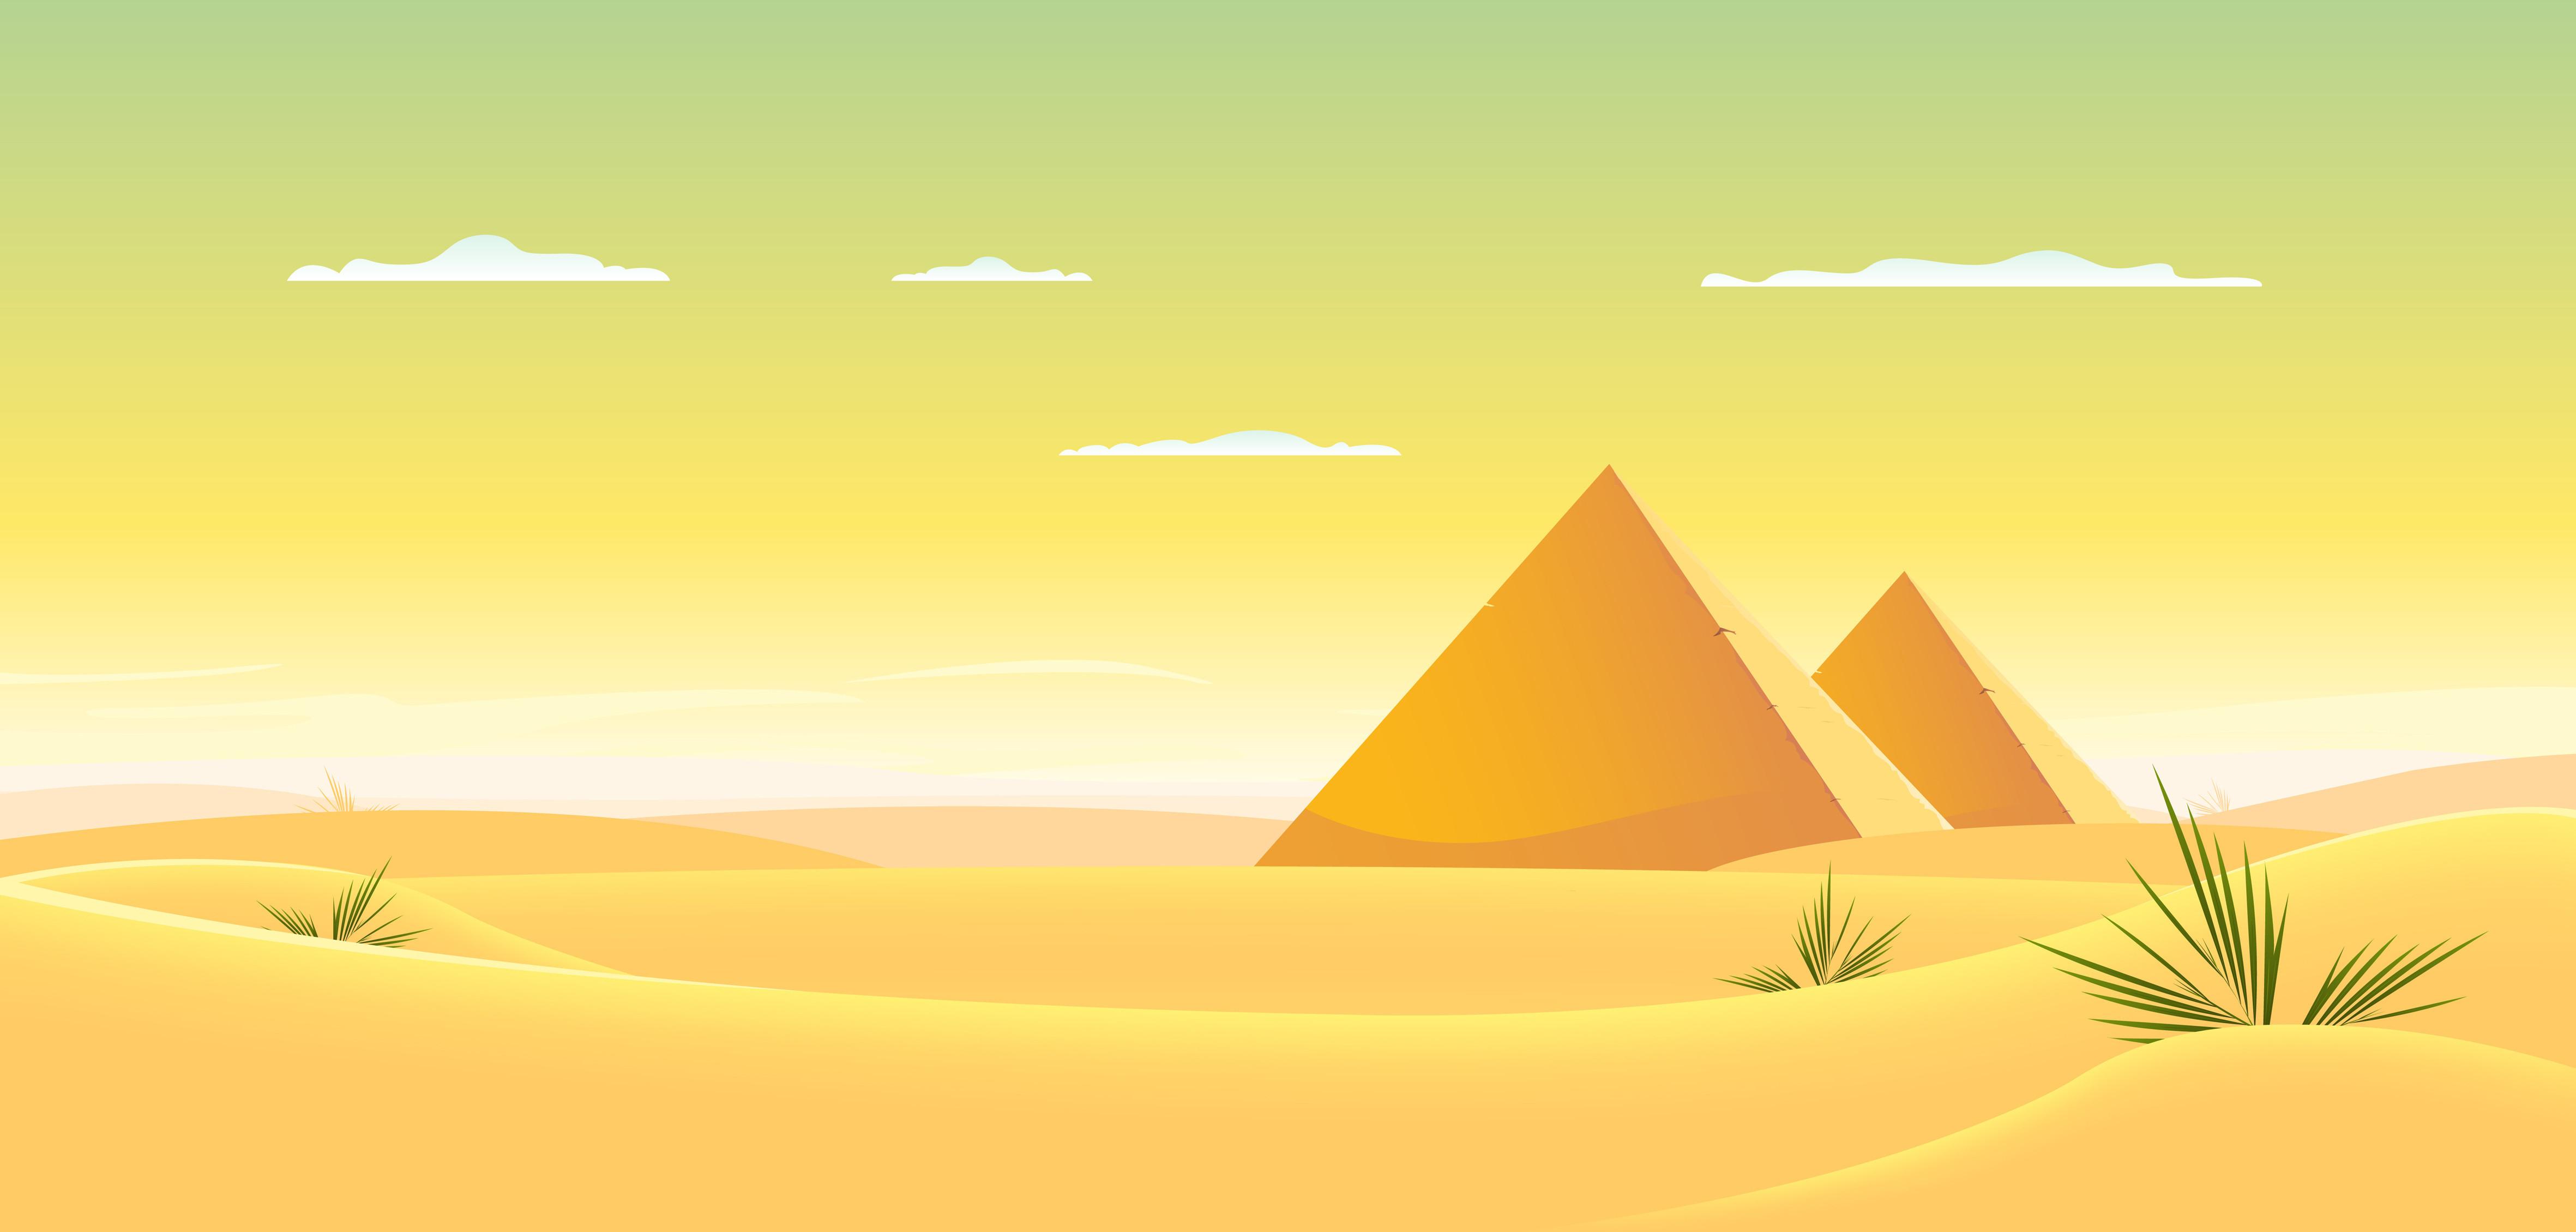 History Egyptian Pyramids Level 1 Activity For Kids